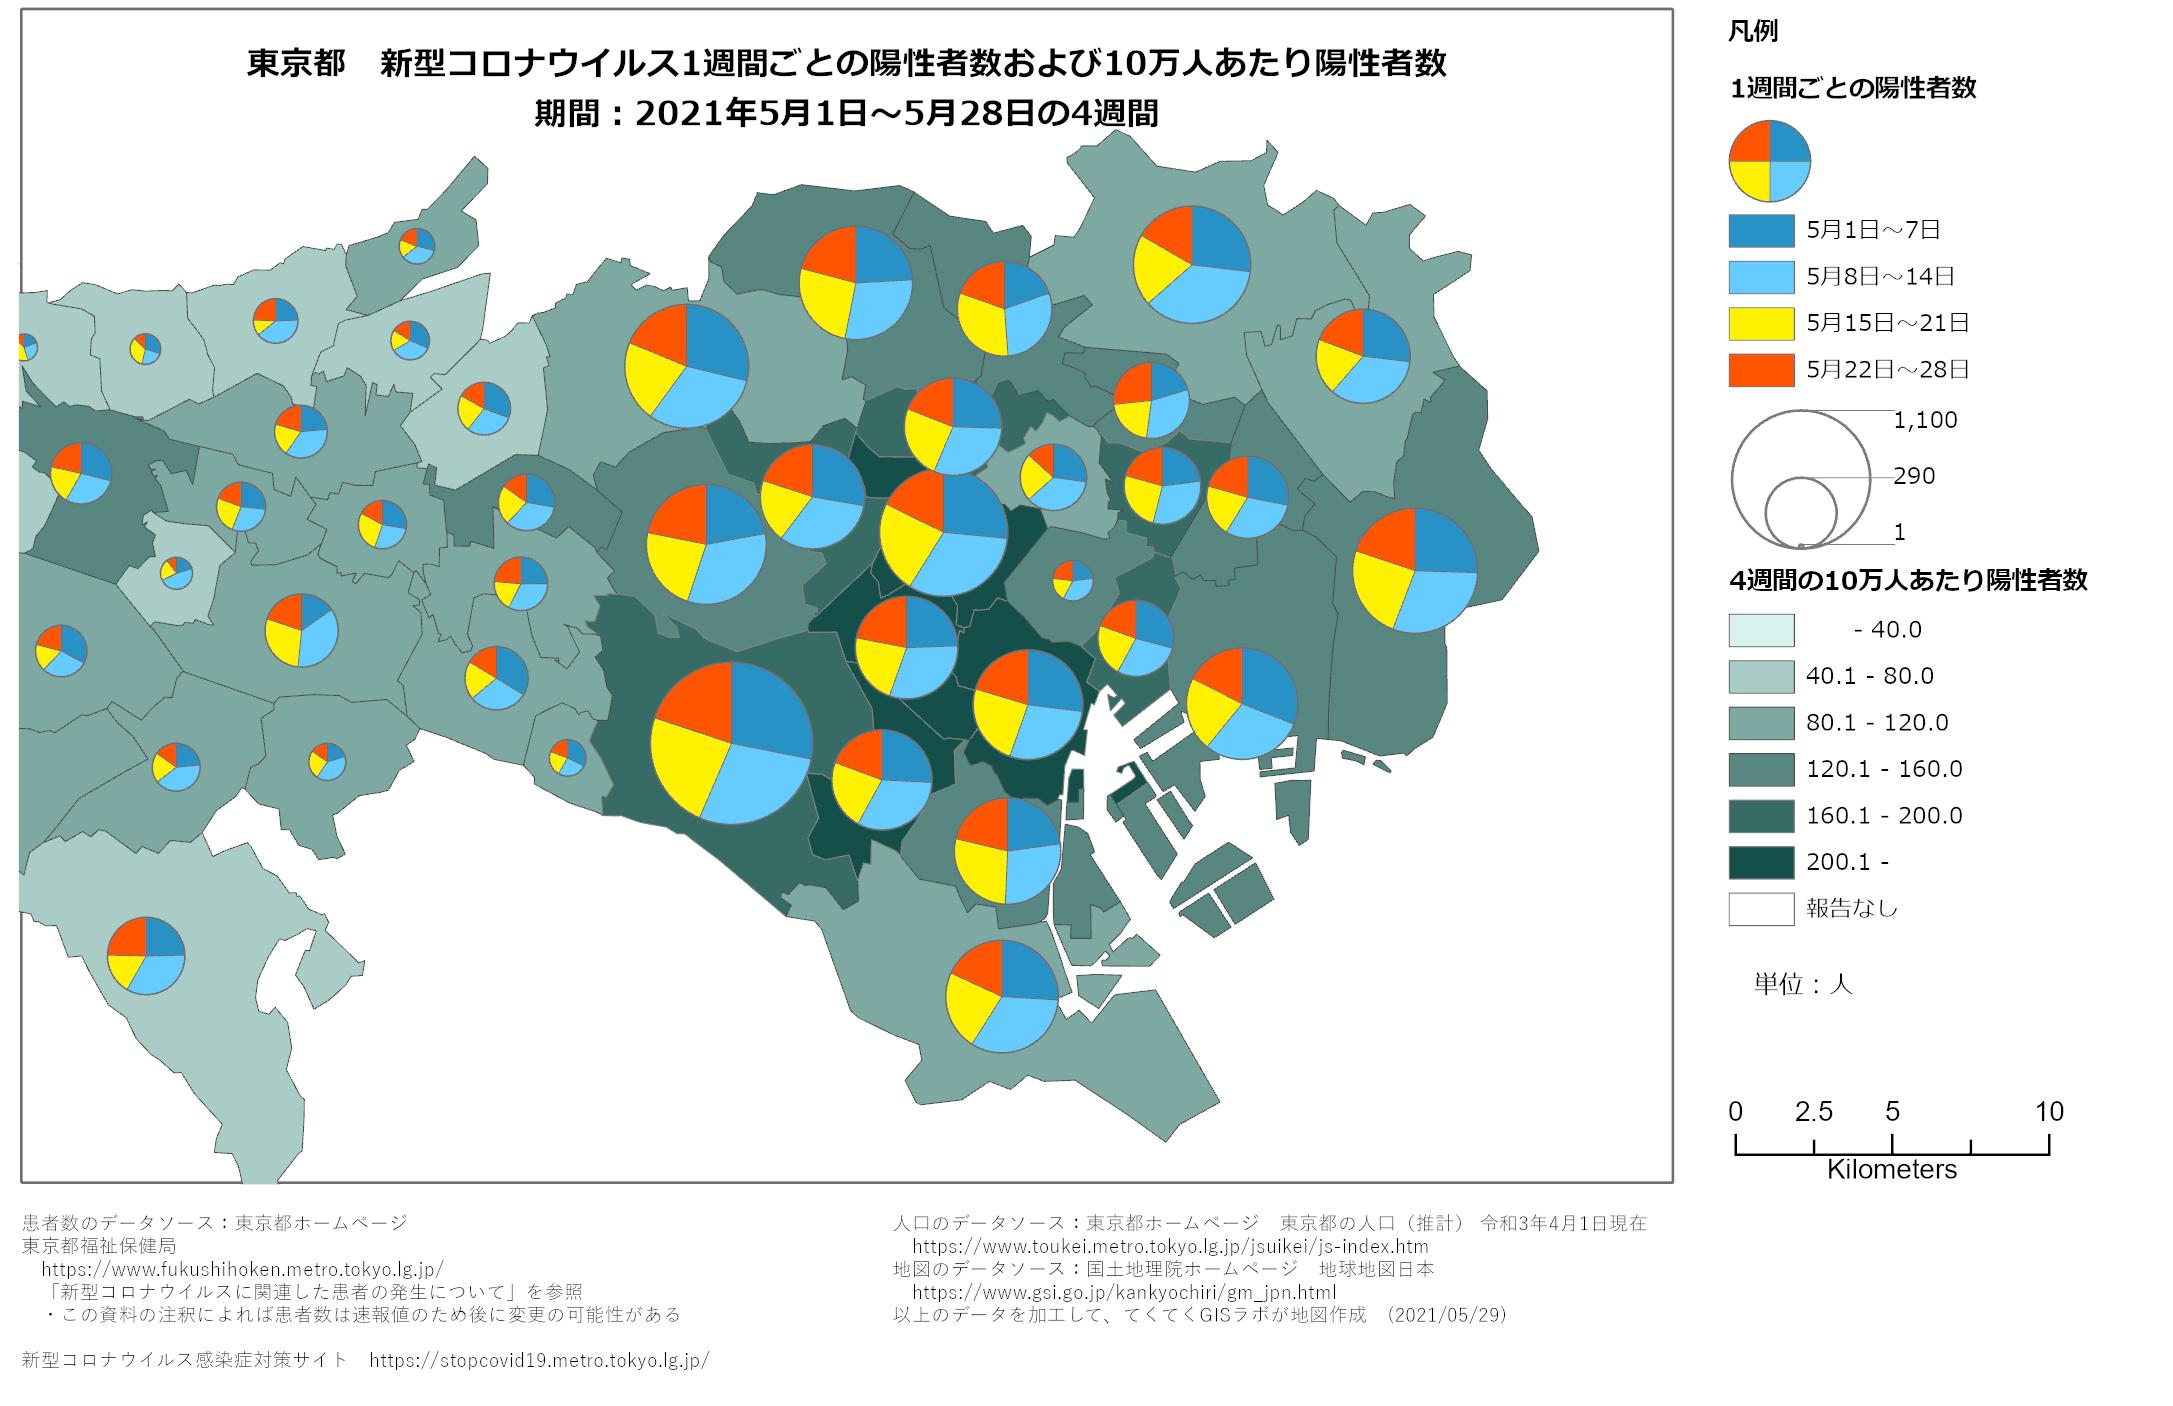 1週間ごと感染者数、東京都、5月1日〜5月28日